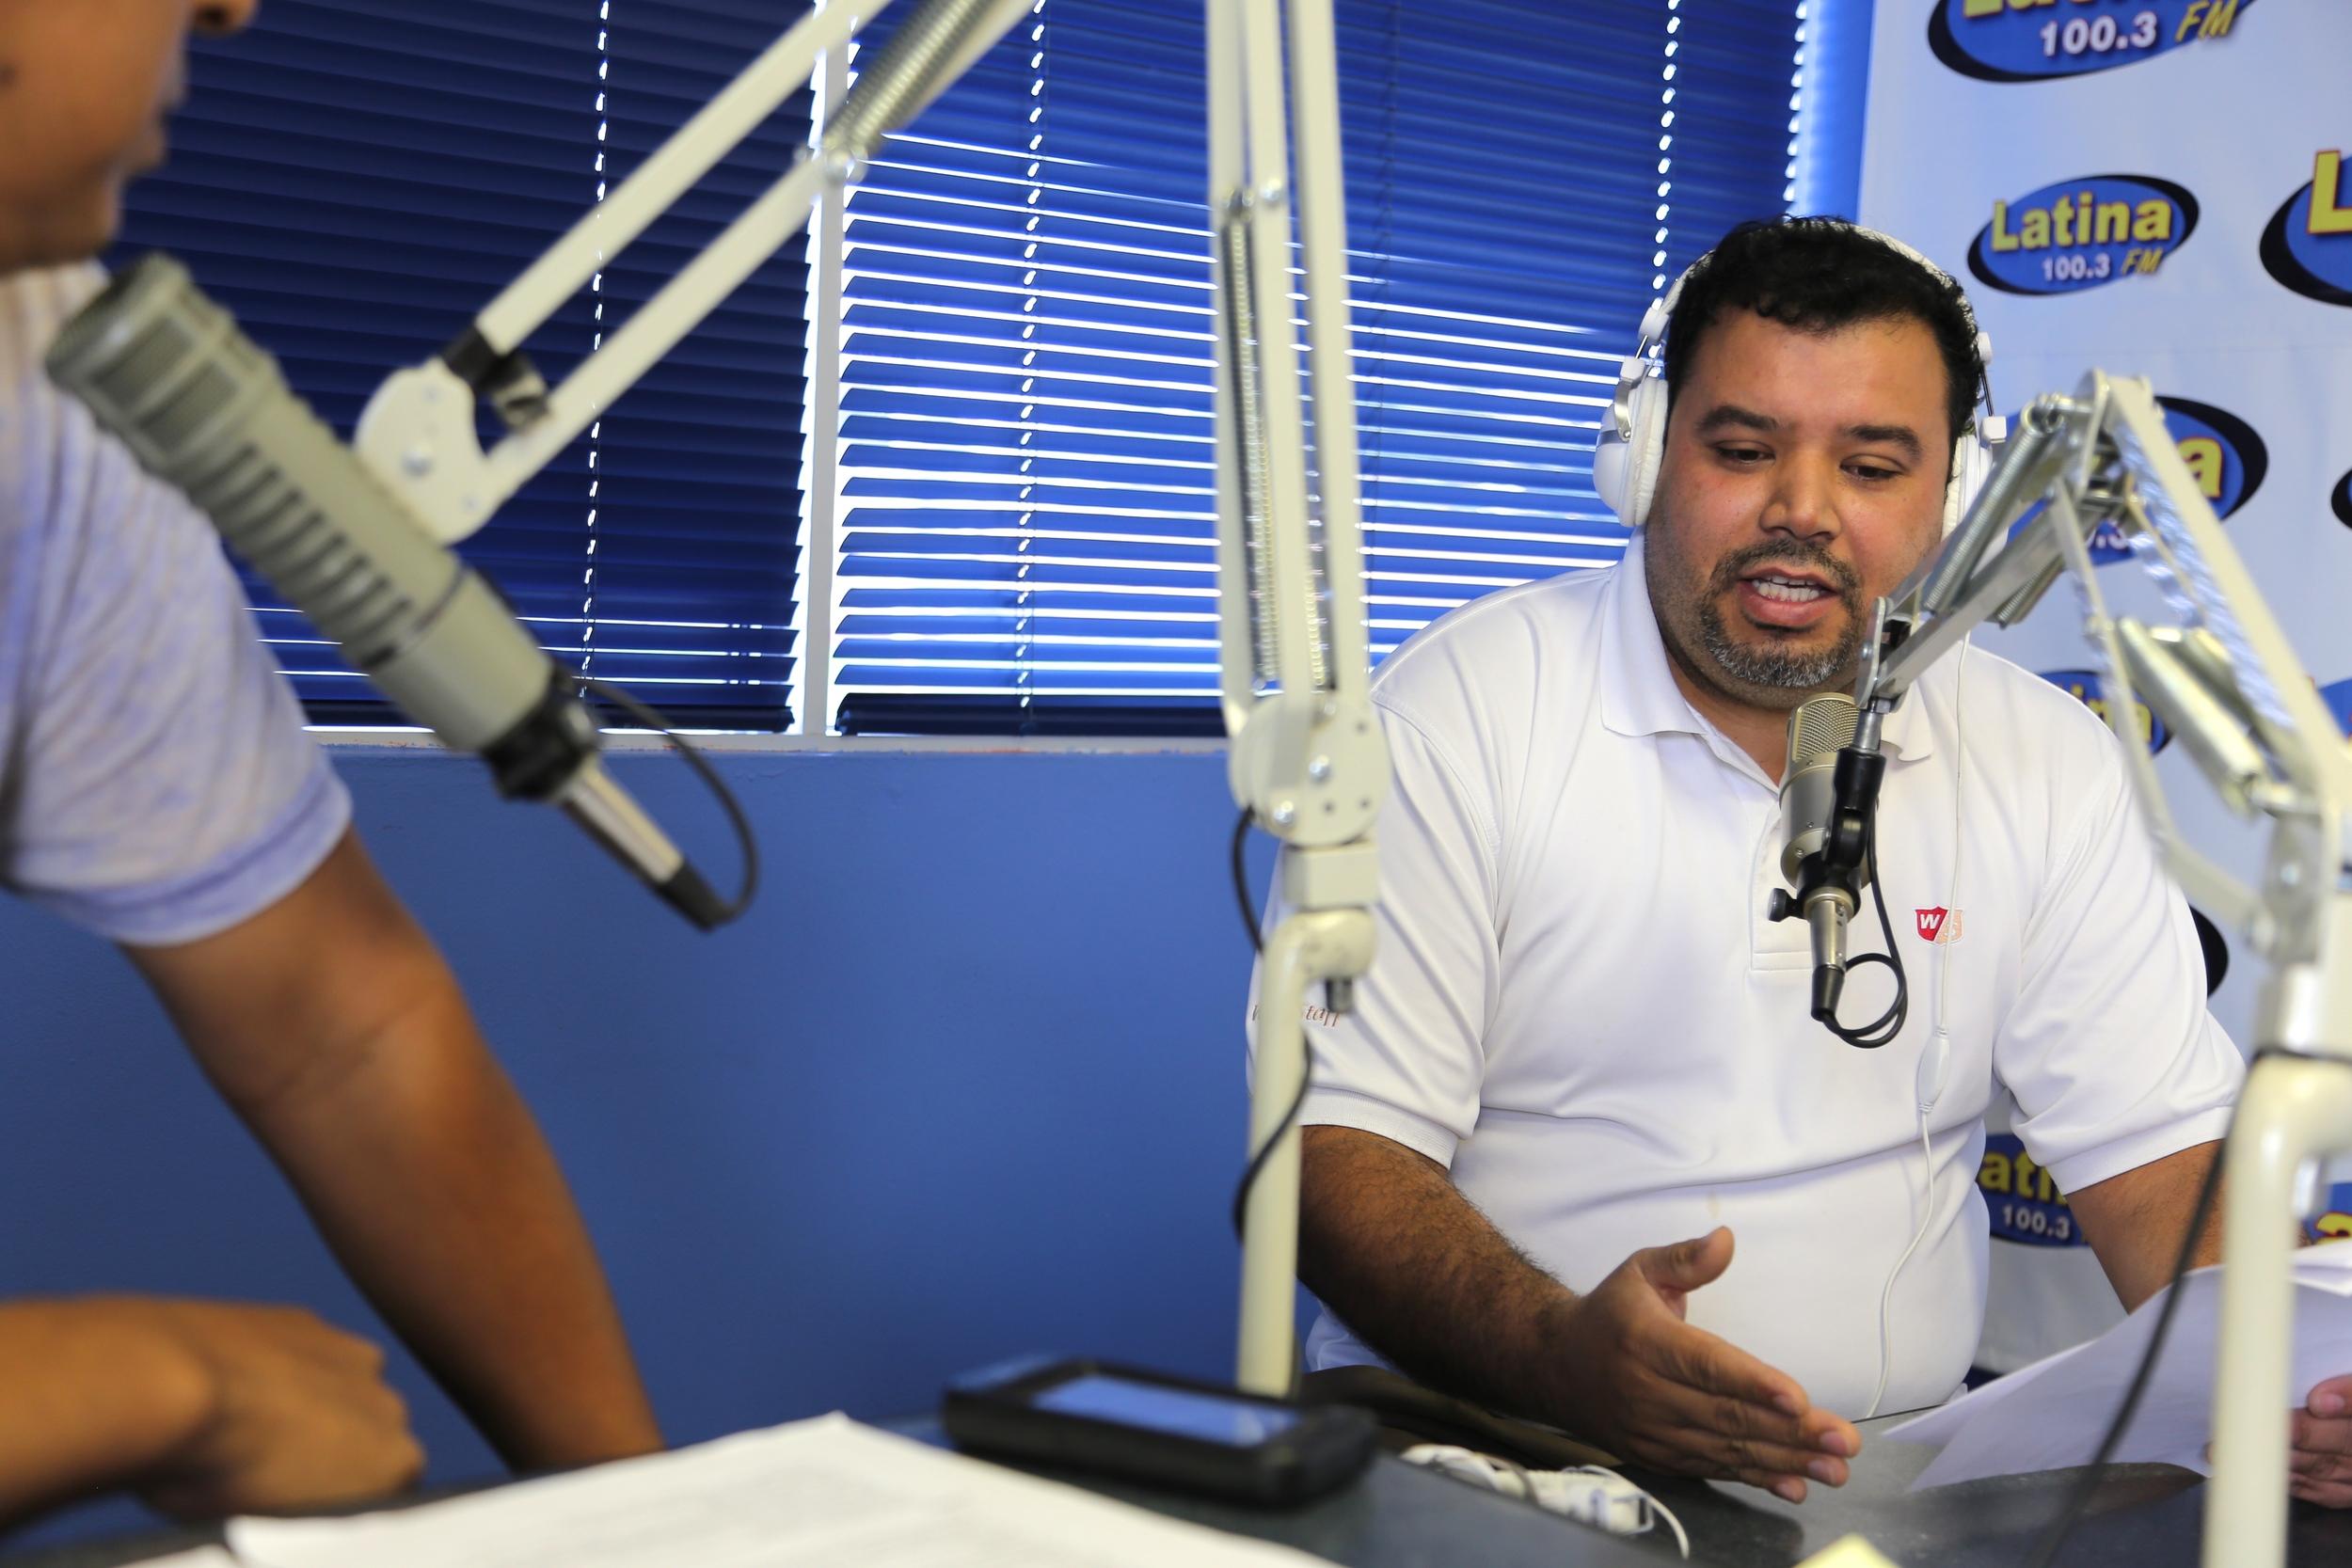 Gerardo Cortez will speak about our campaign against AvalonBay onRadio Latina 100.3